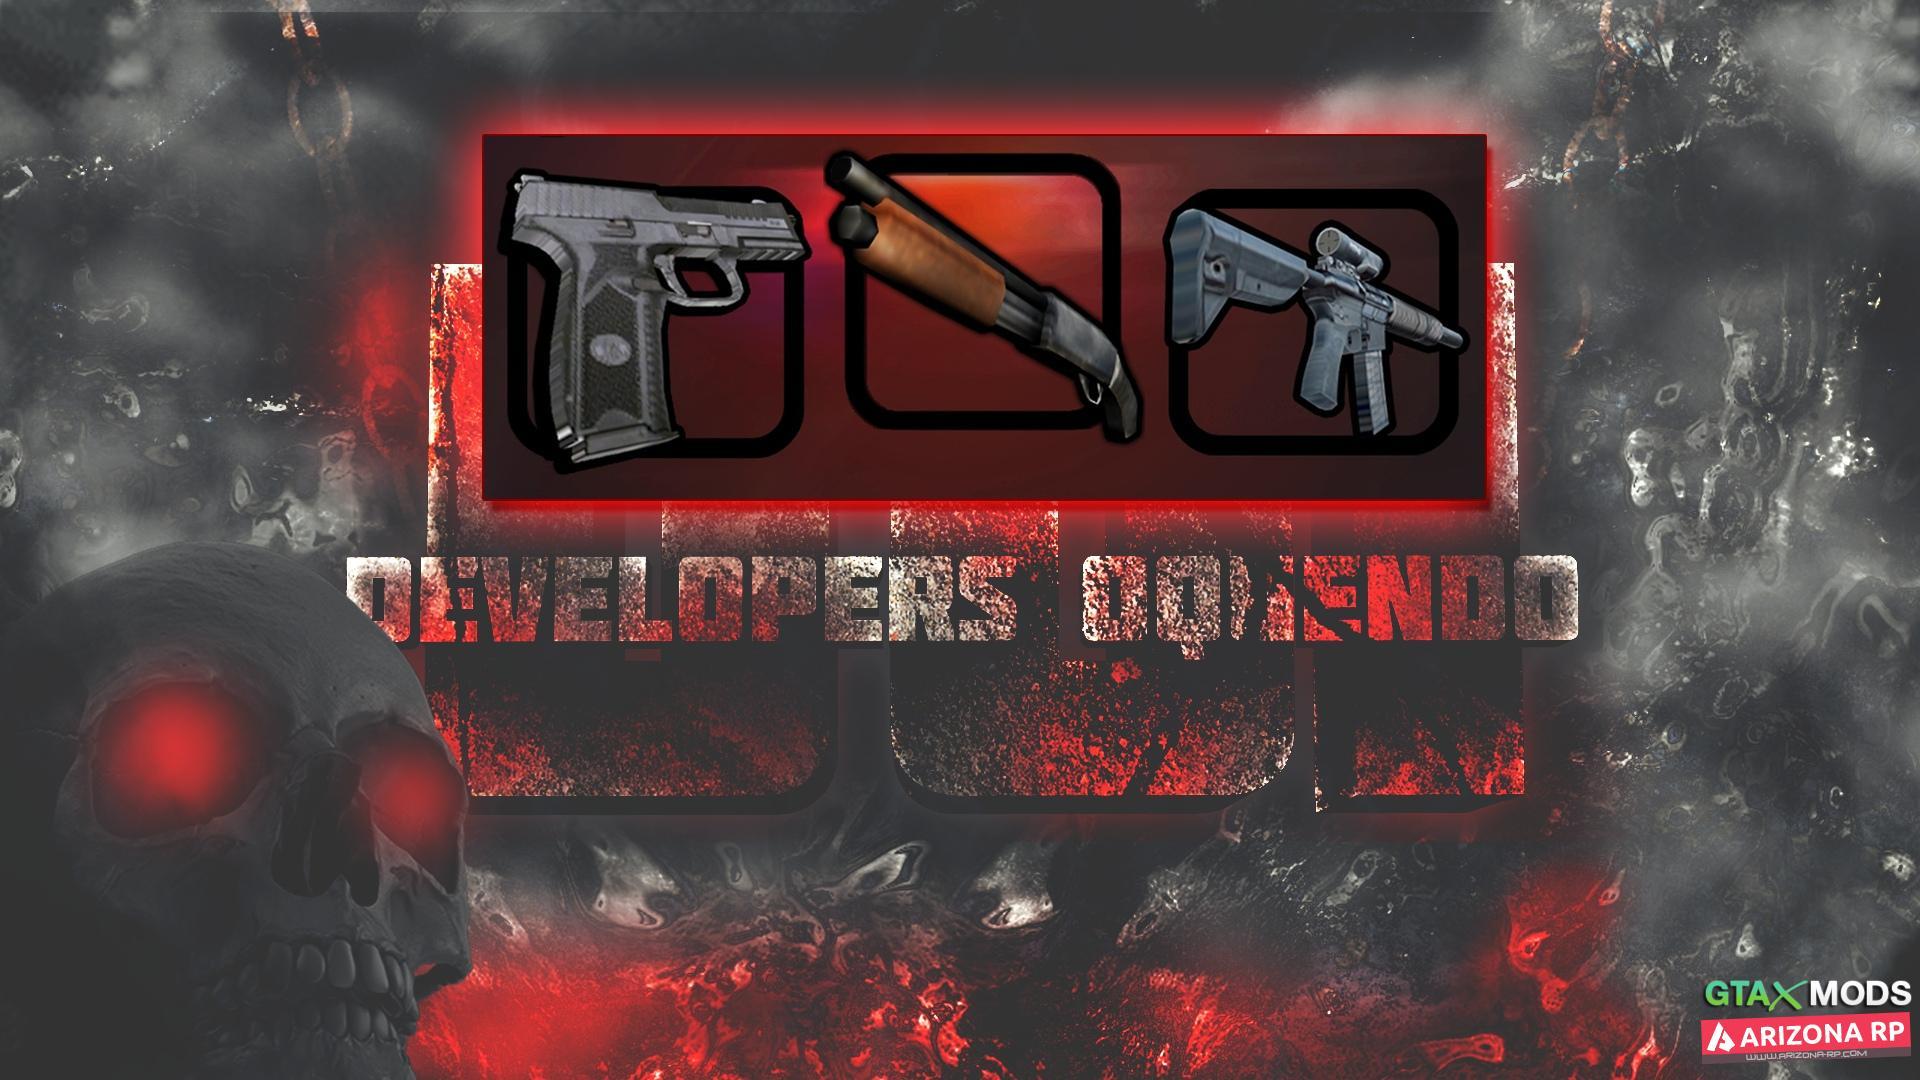 Low-Quality Guns